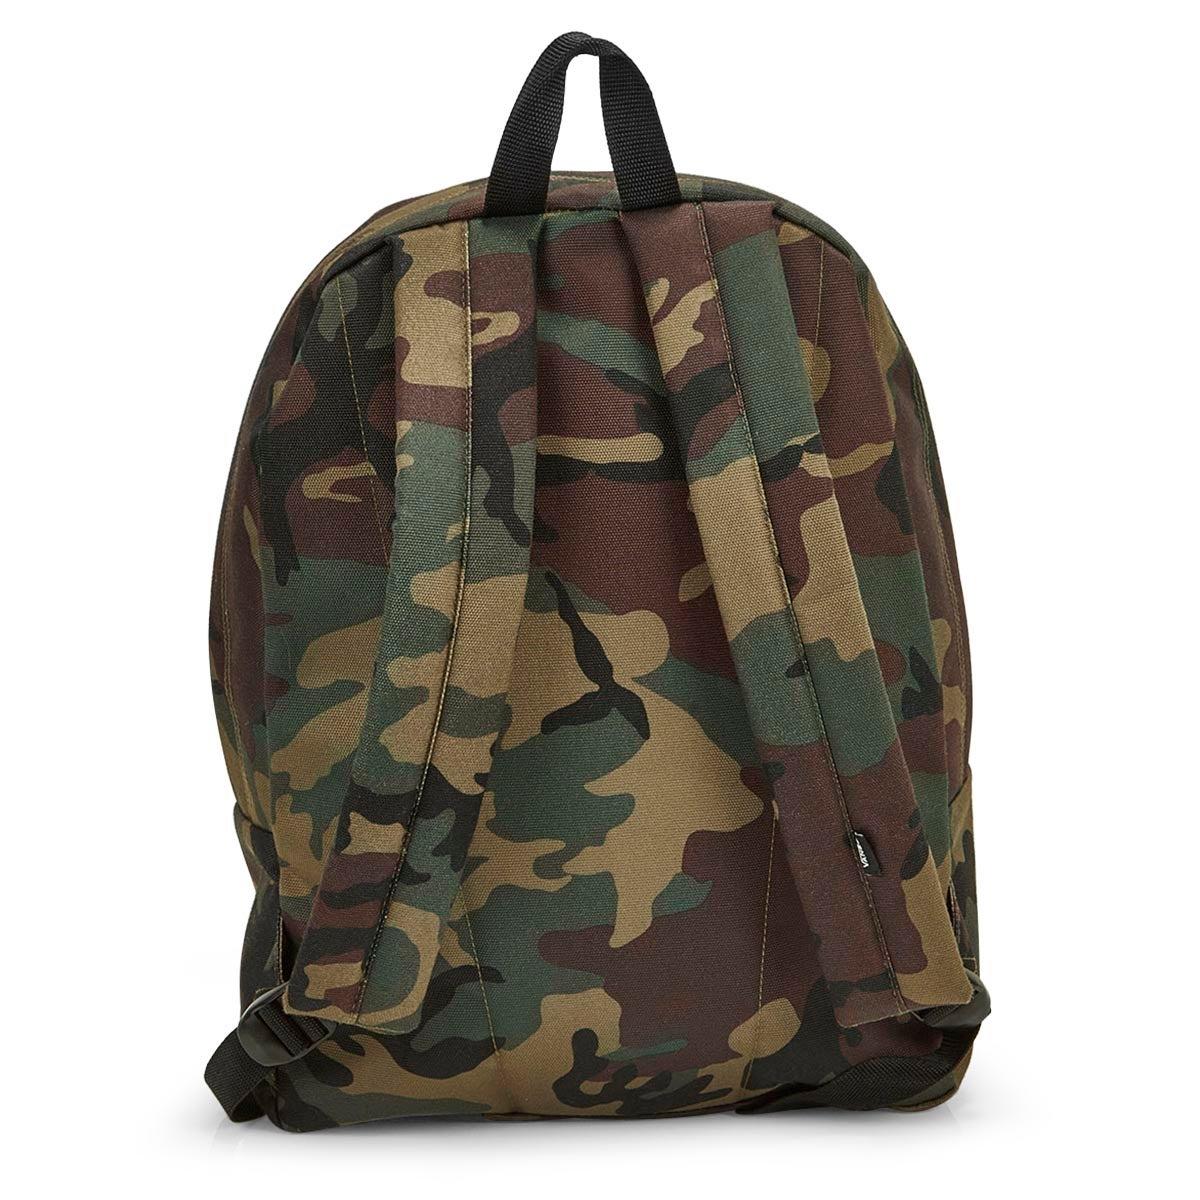 Vans Old Skool II classic camo backpack